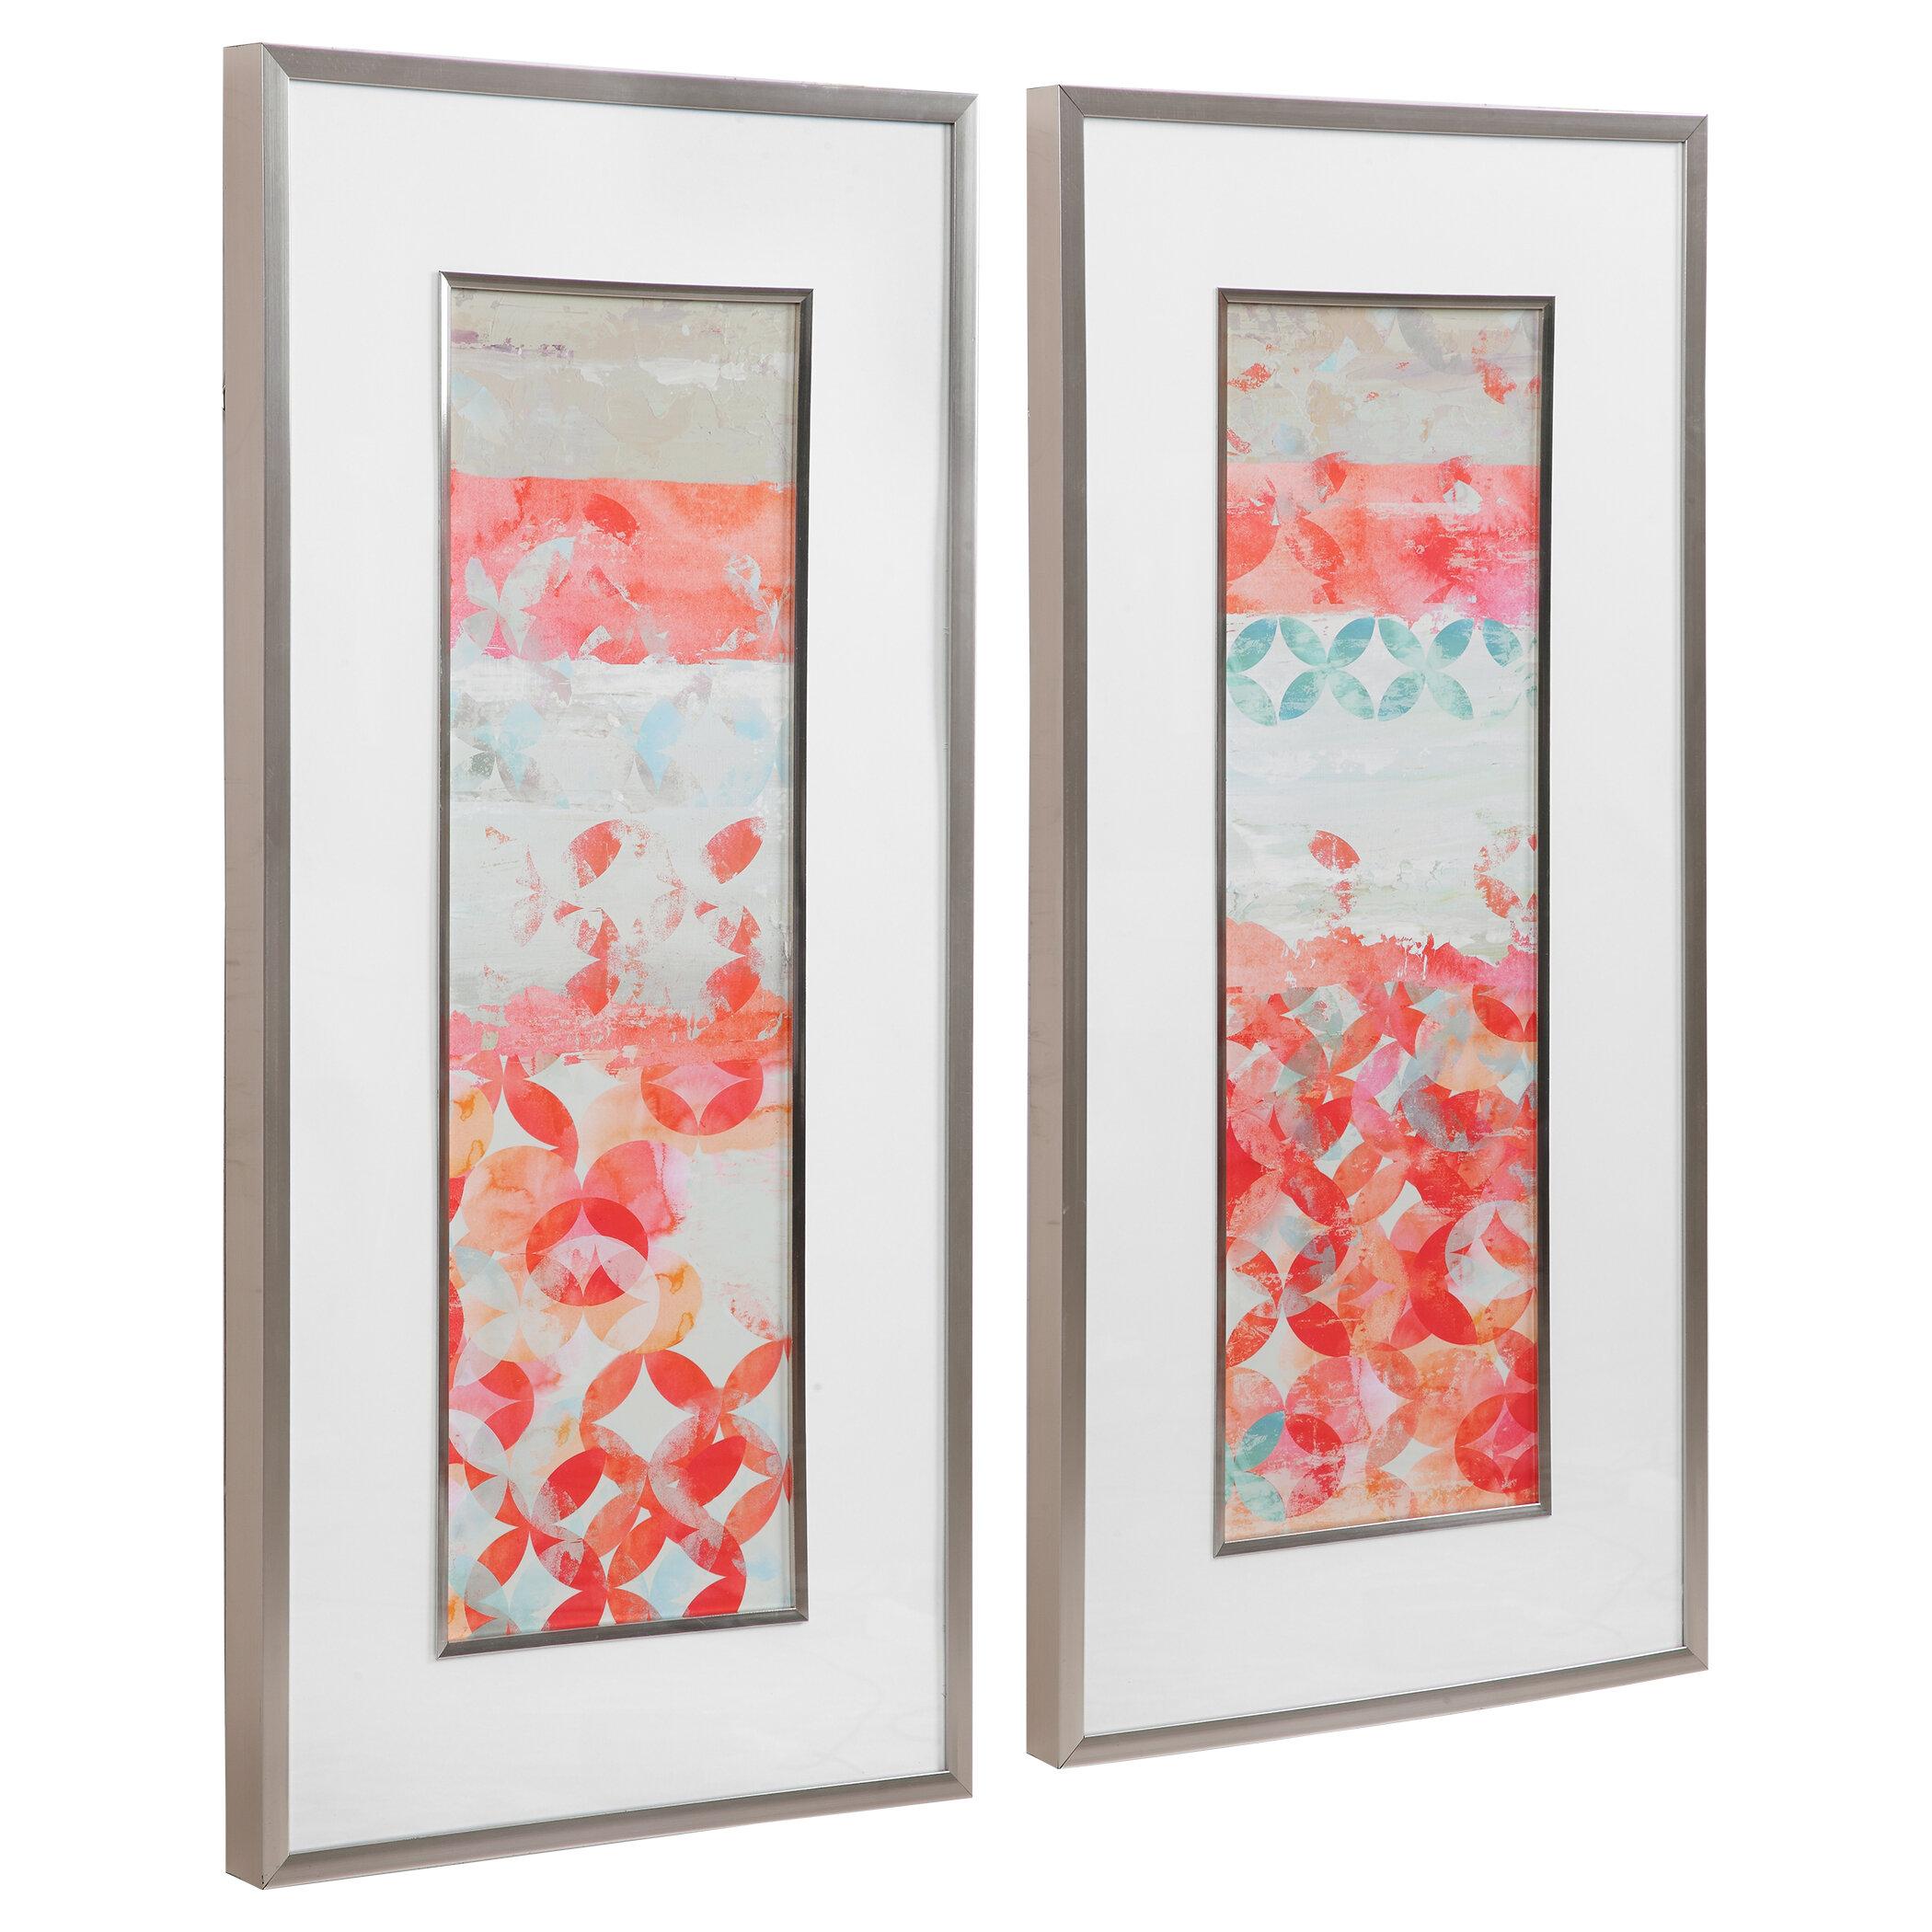 Brayden Studio 2 Piece Picture Frame Painting Print Set On Paper Wayfair